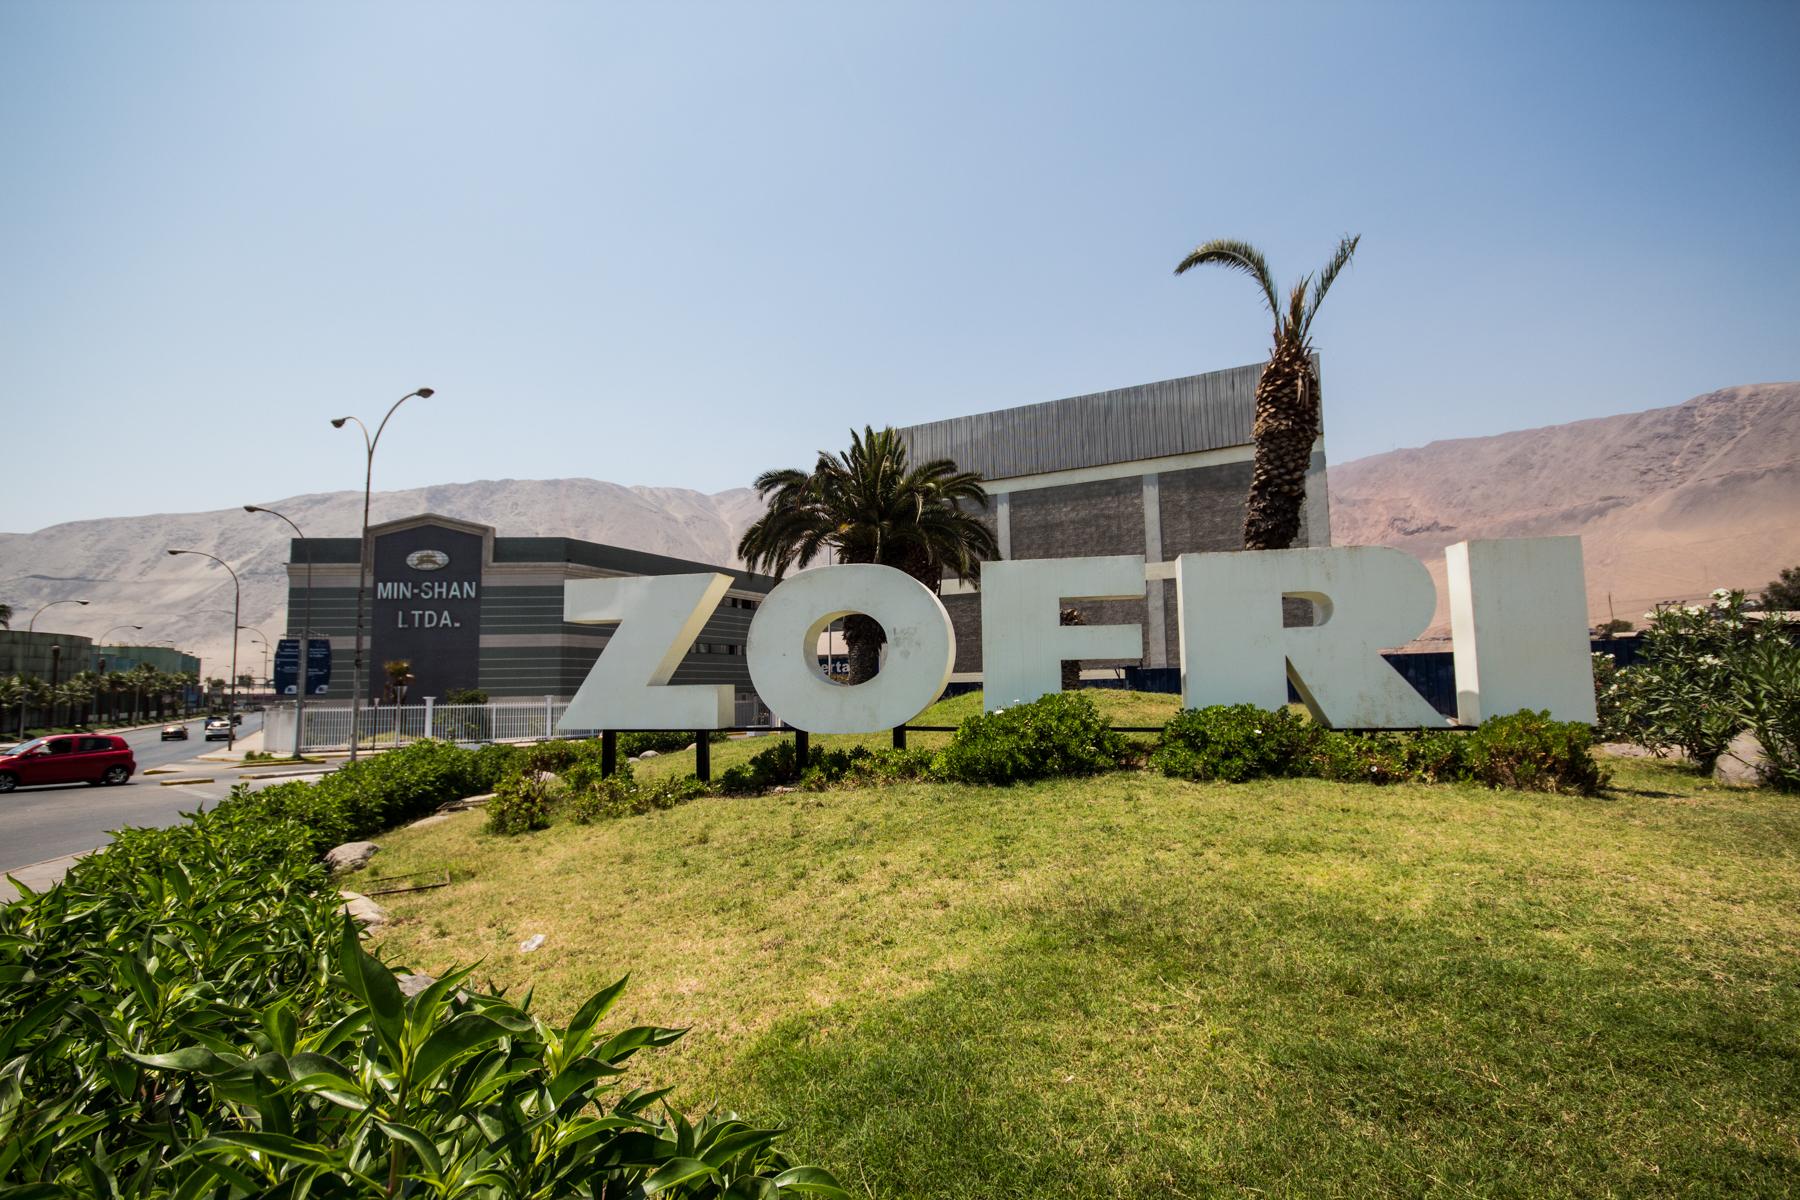 Guía Urbana de Chile: Mall ZOFRI, Iquique, Plataforma Urbana